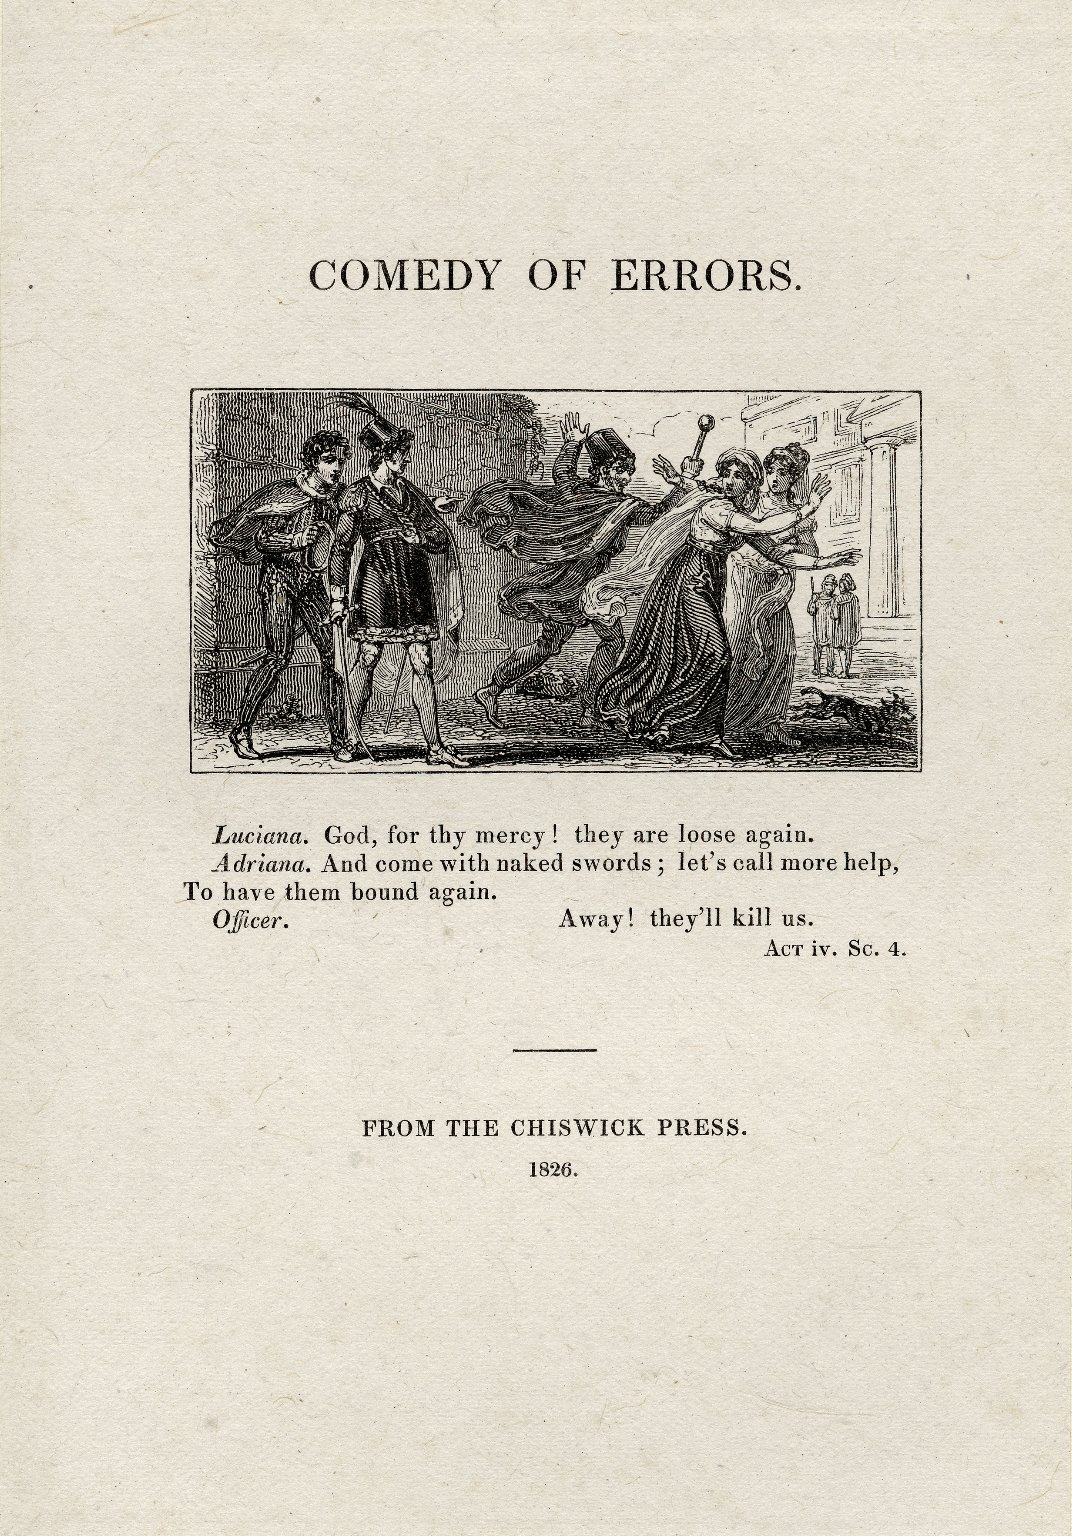 Comedy of Errors Act 4, Scene 4